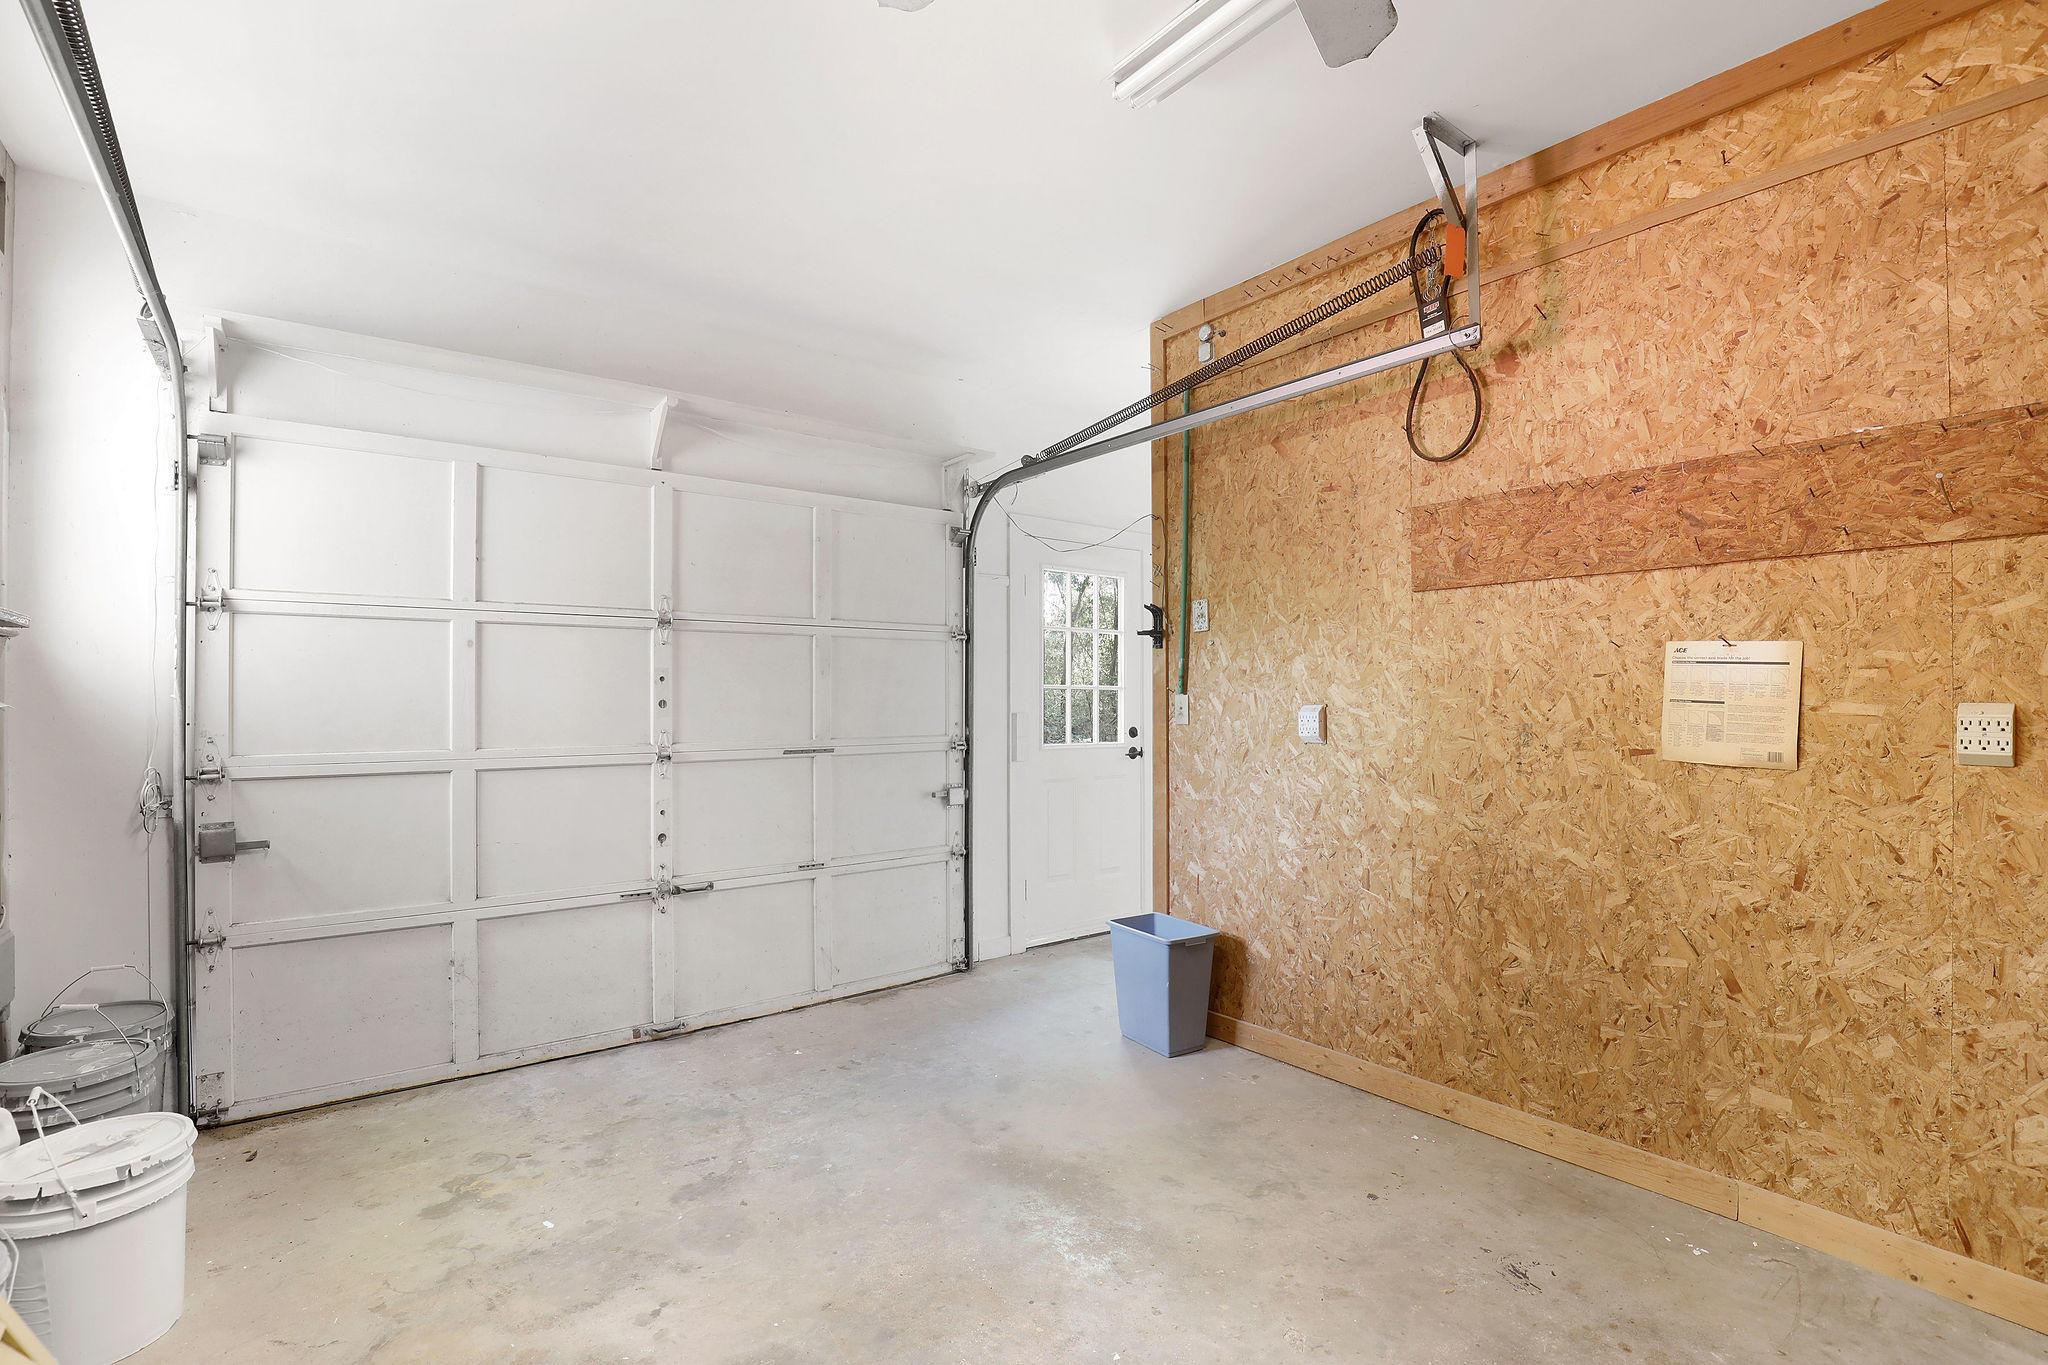 Old Mt Pleasant Homes For Sale - 1417 Edwards, Mount Pleasant, SC - 33